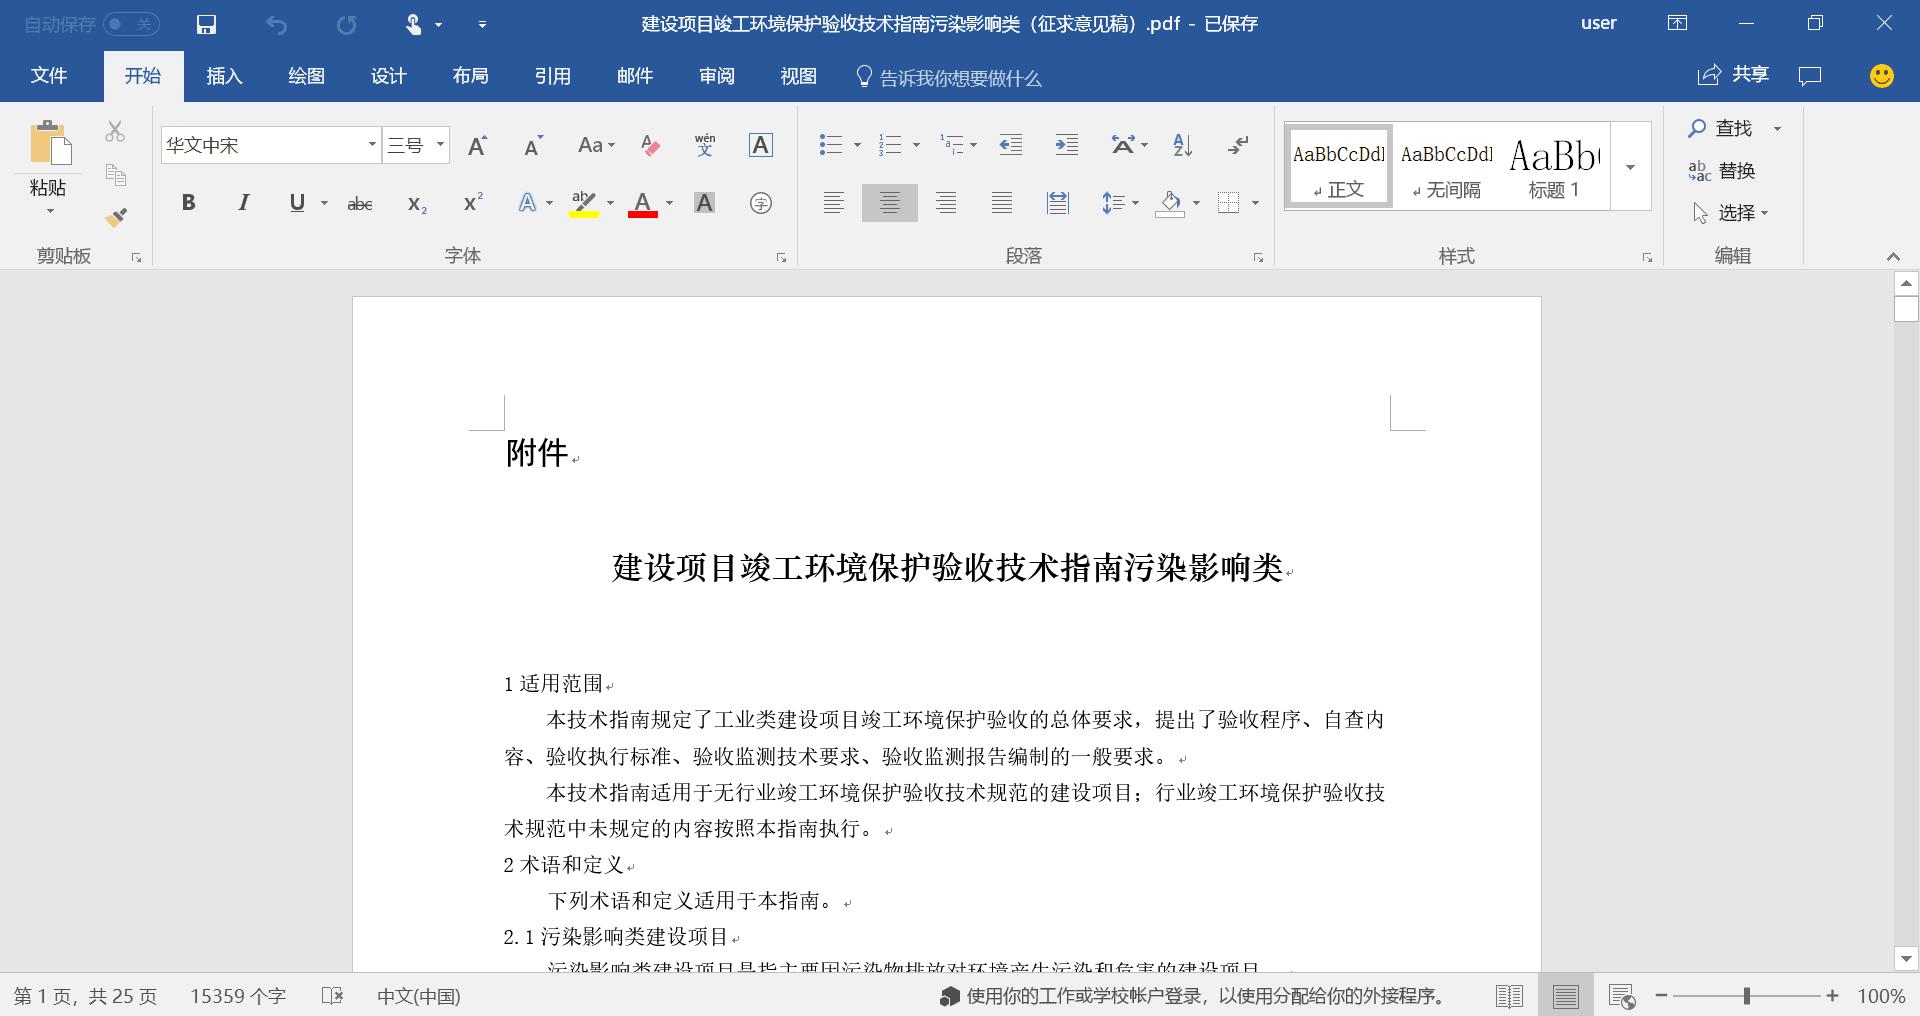 PDF 转换、合并、切边,用这些 Windows 小工具轻松搞定-吐槽福利